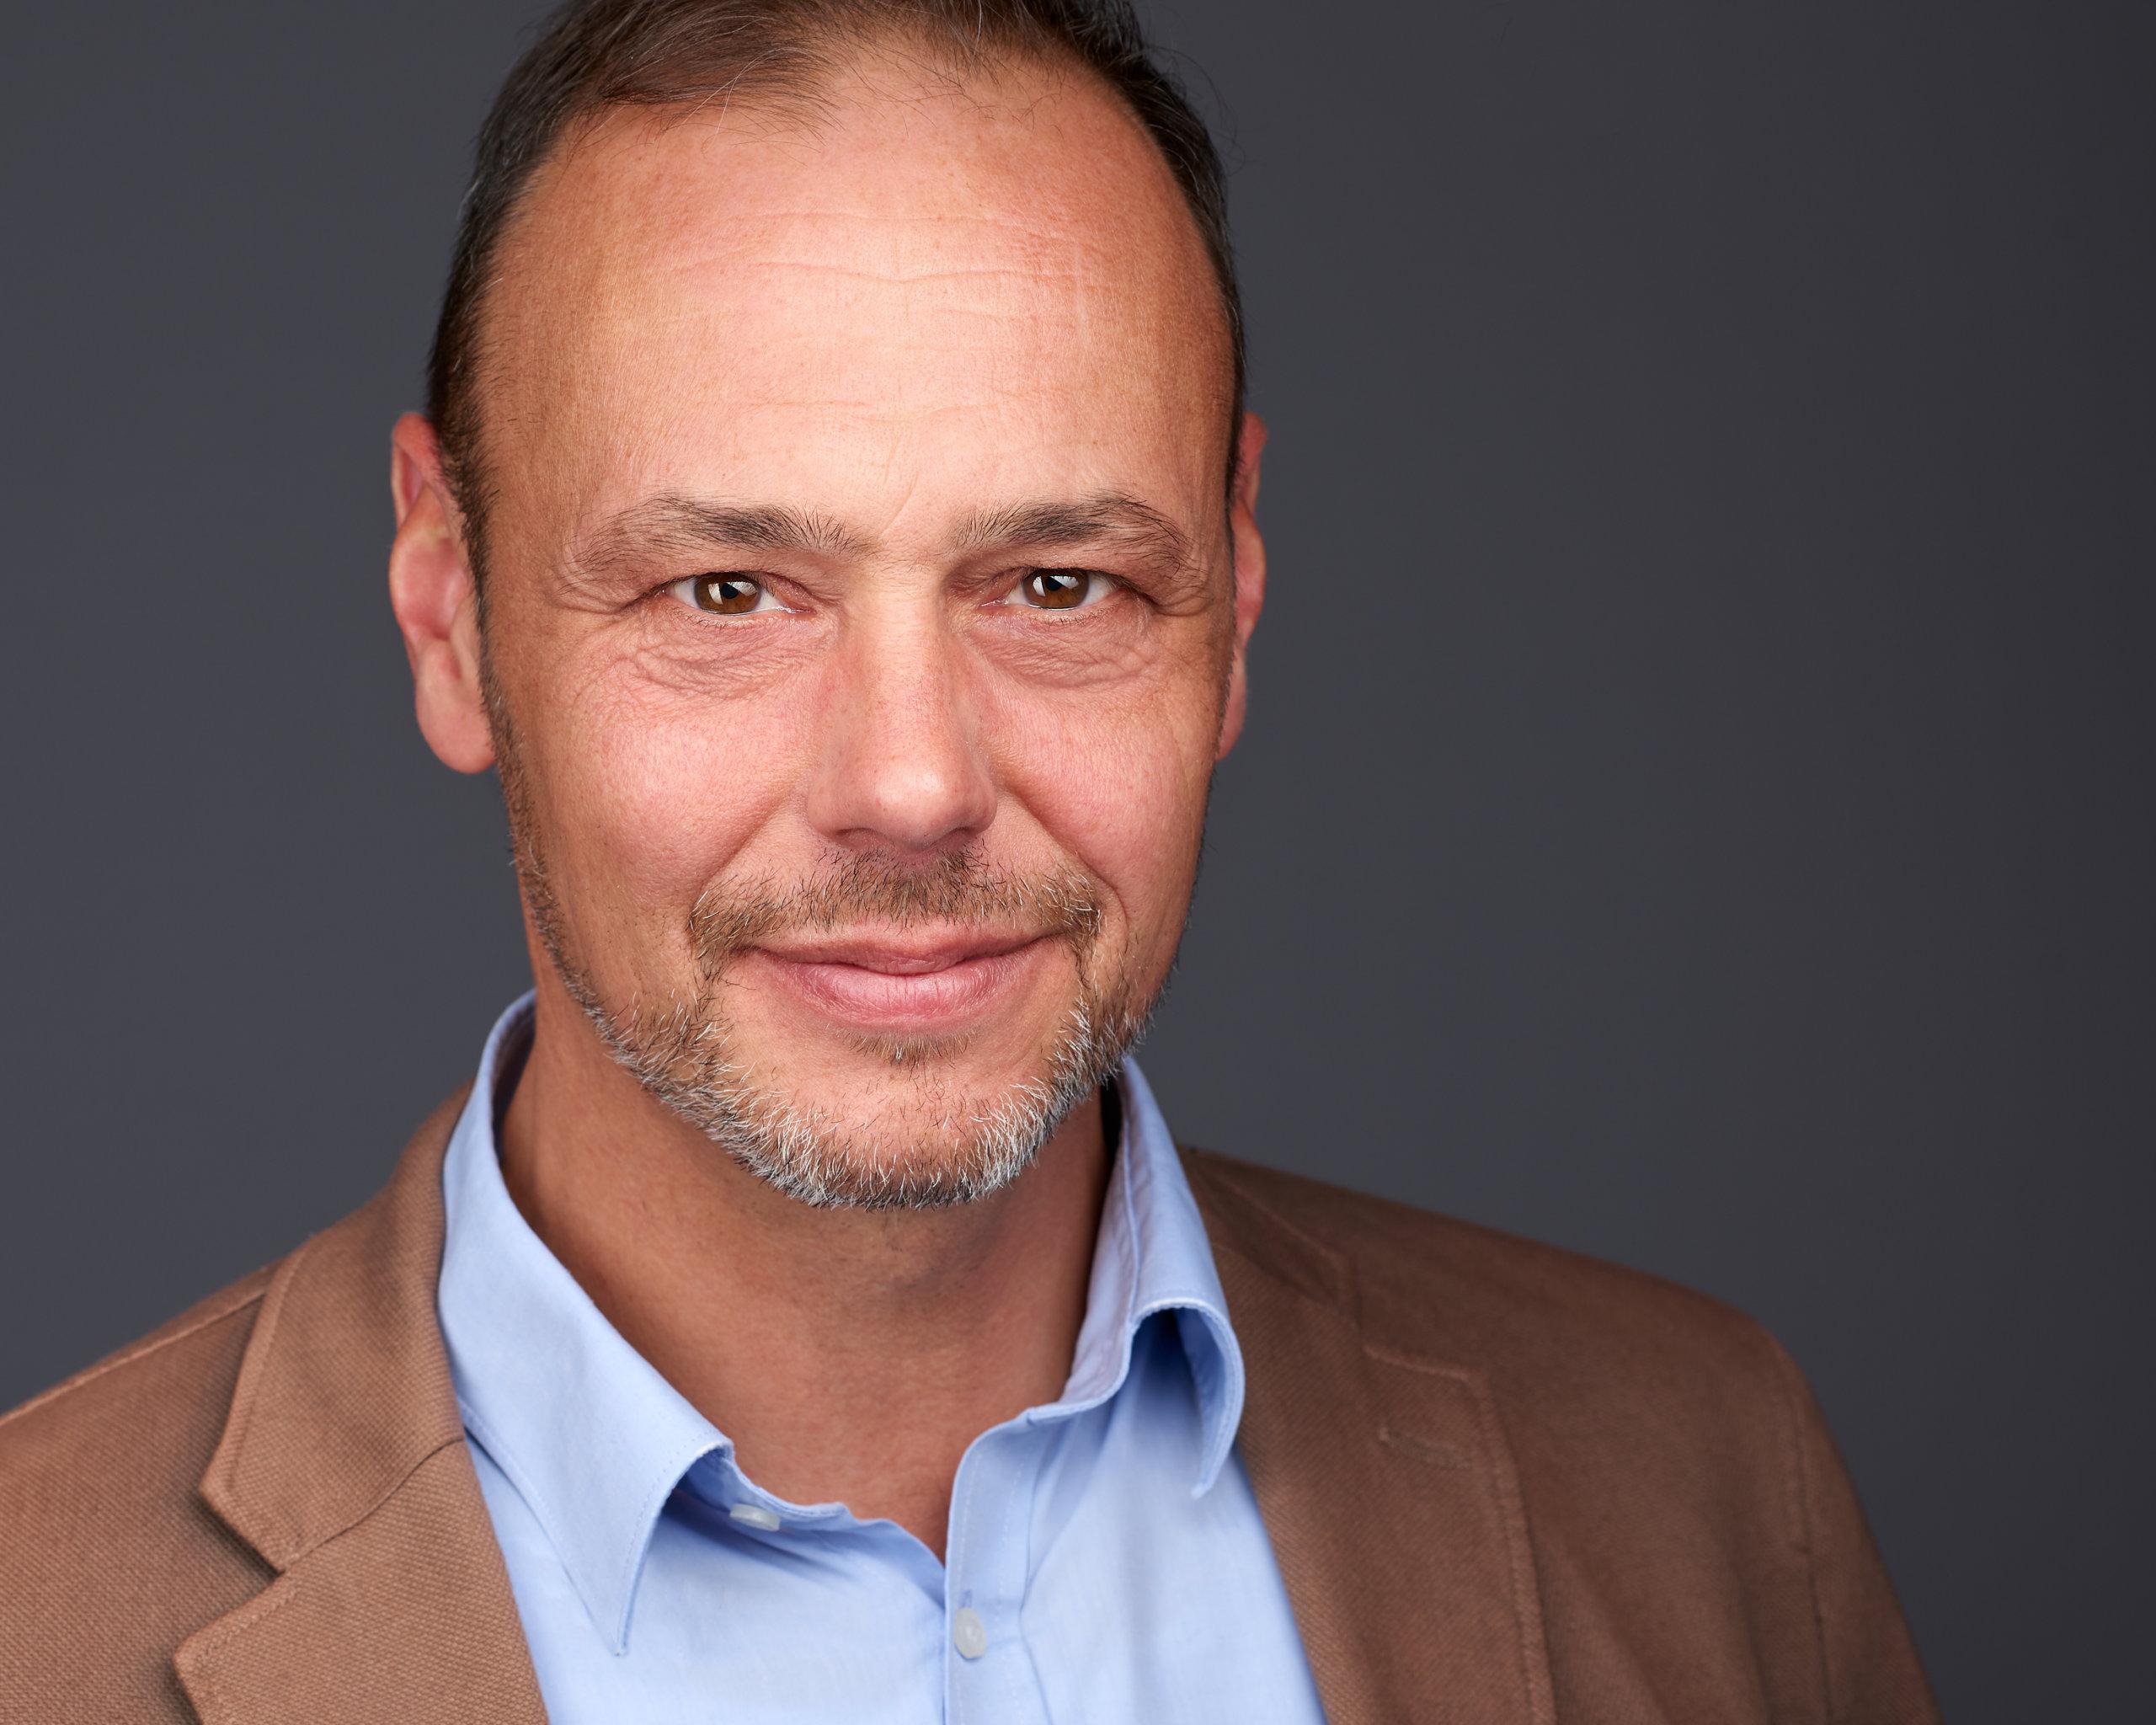 Mario Gebers